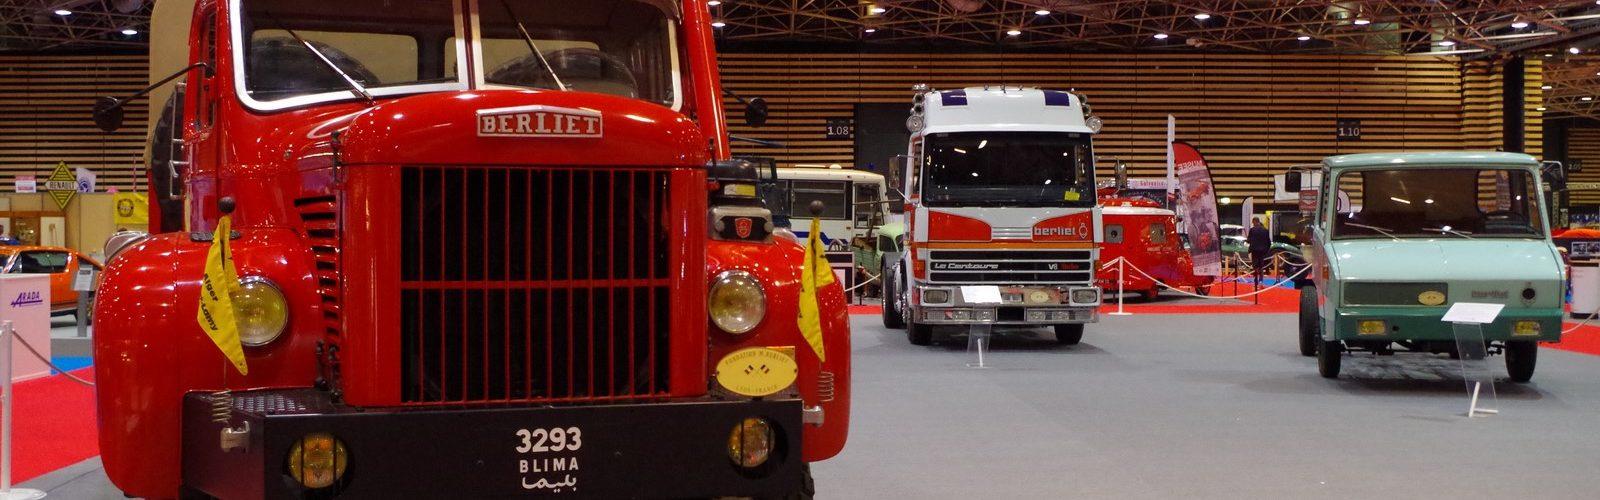 Berliet Camions EpoquAuto 2018 45